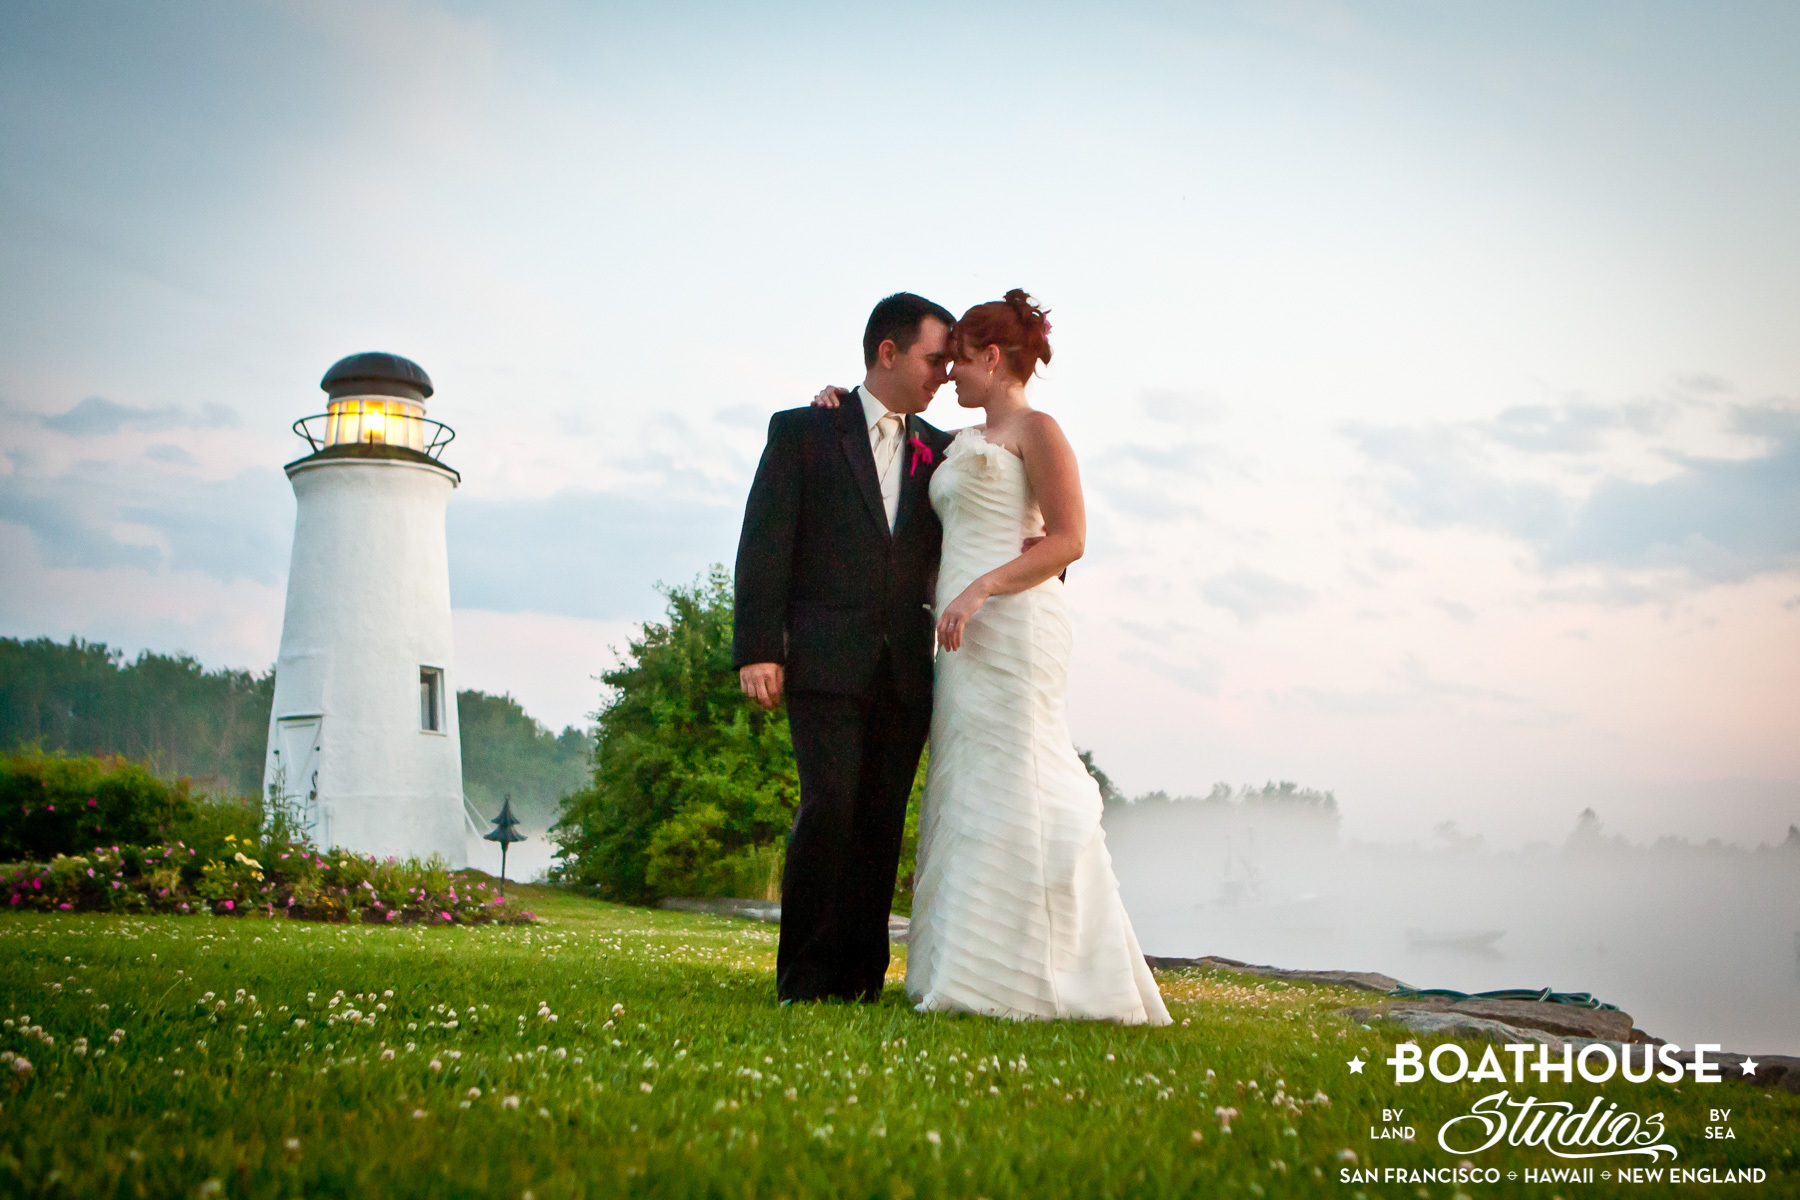 Lighthouse Wedding at The Nonantum